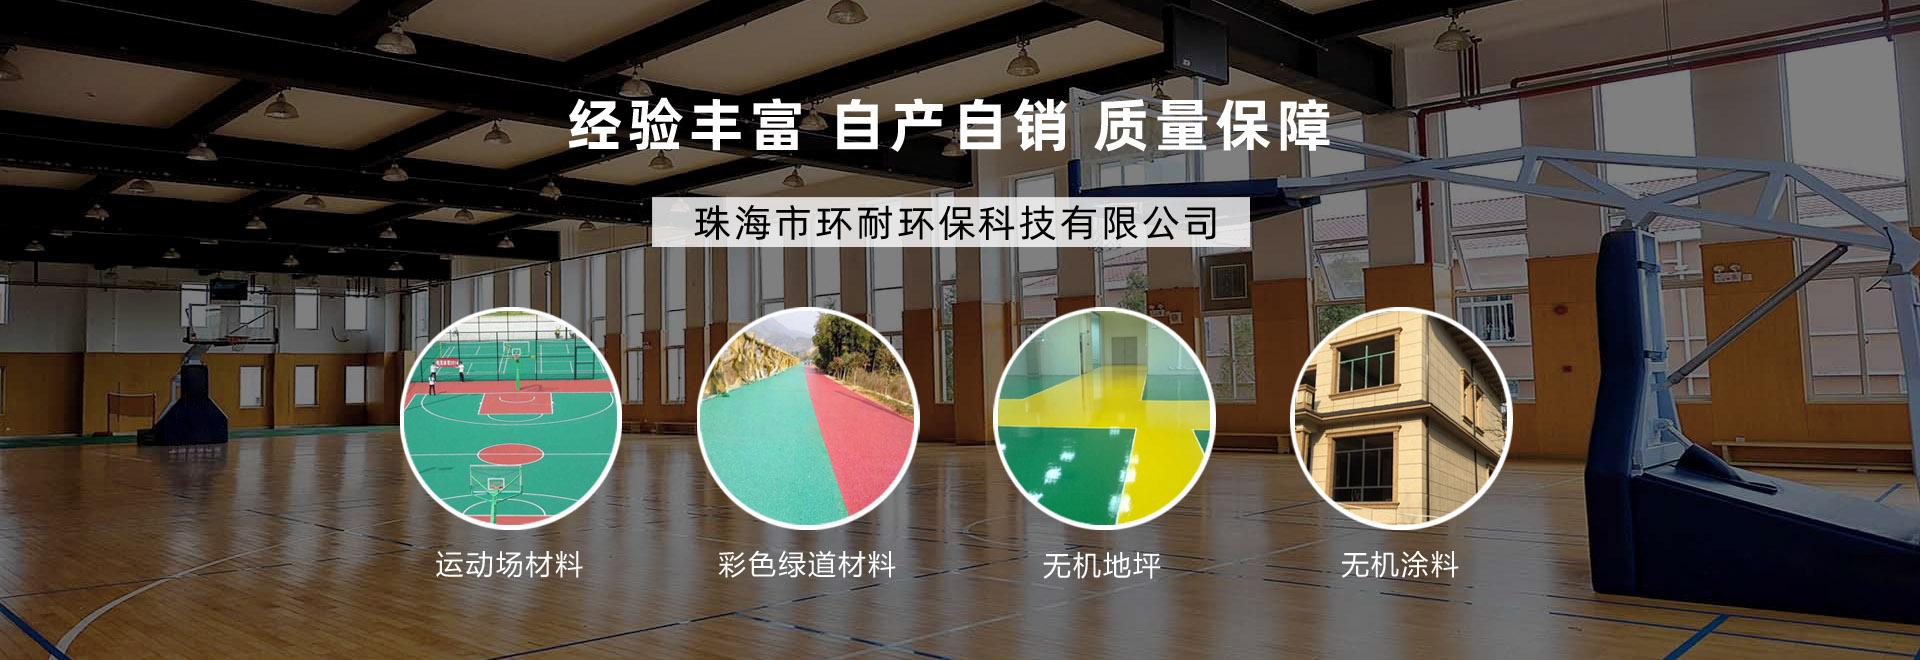 硅PU球场材料banner